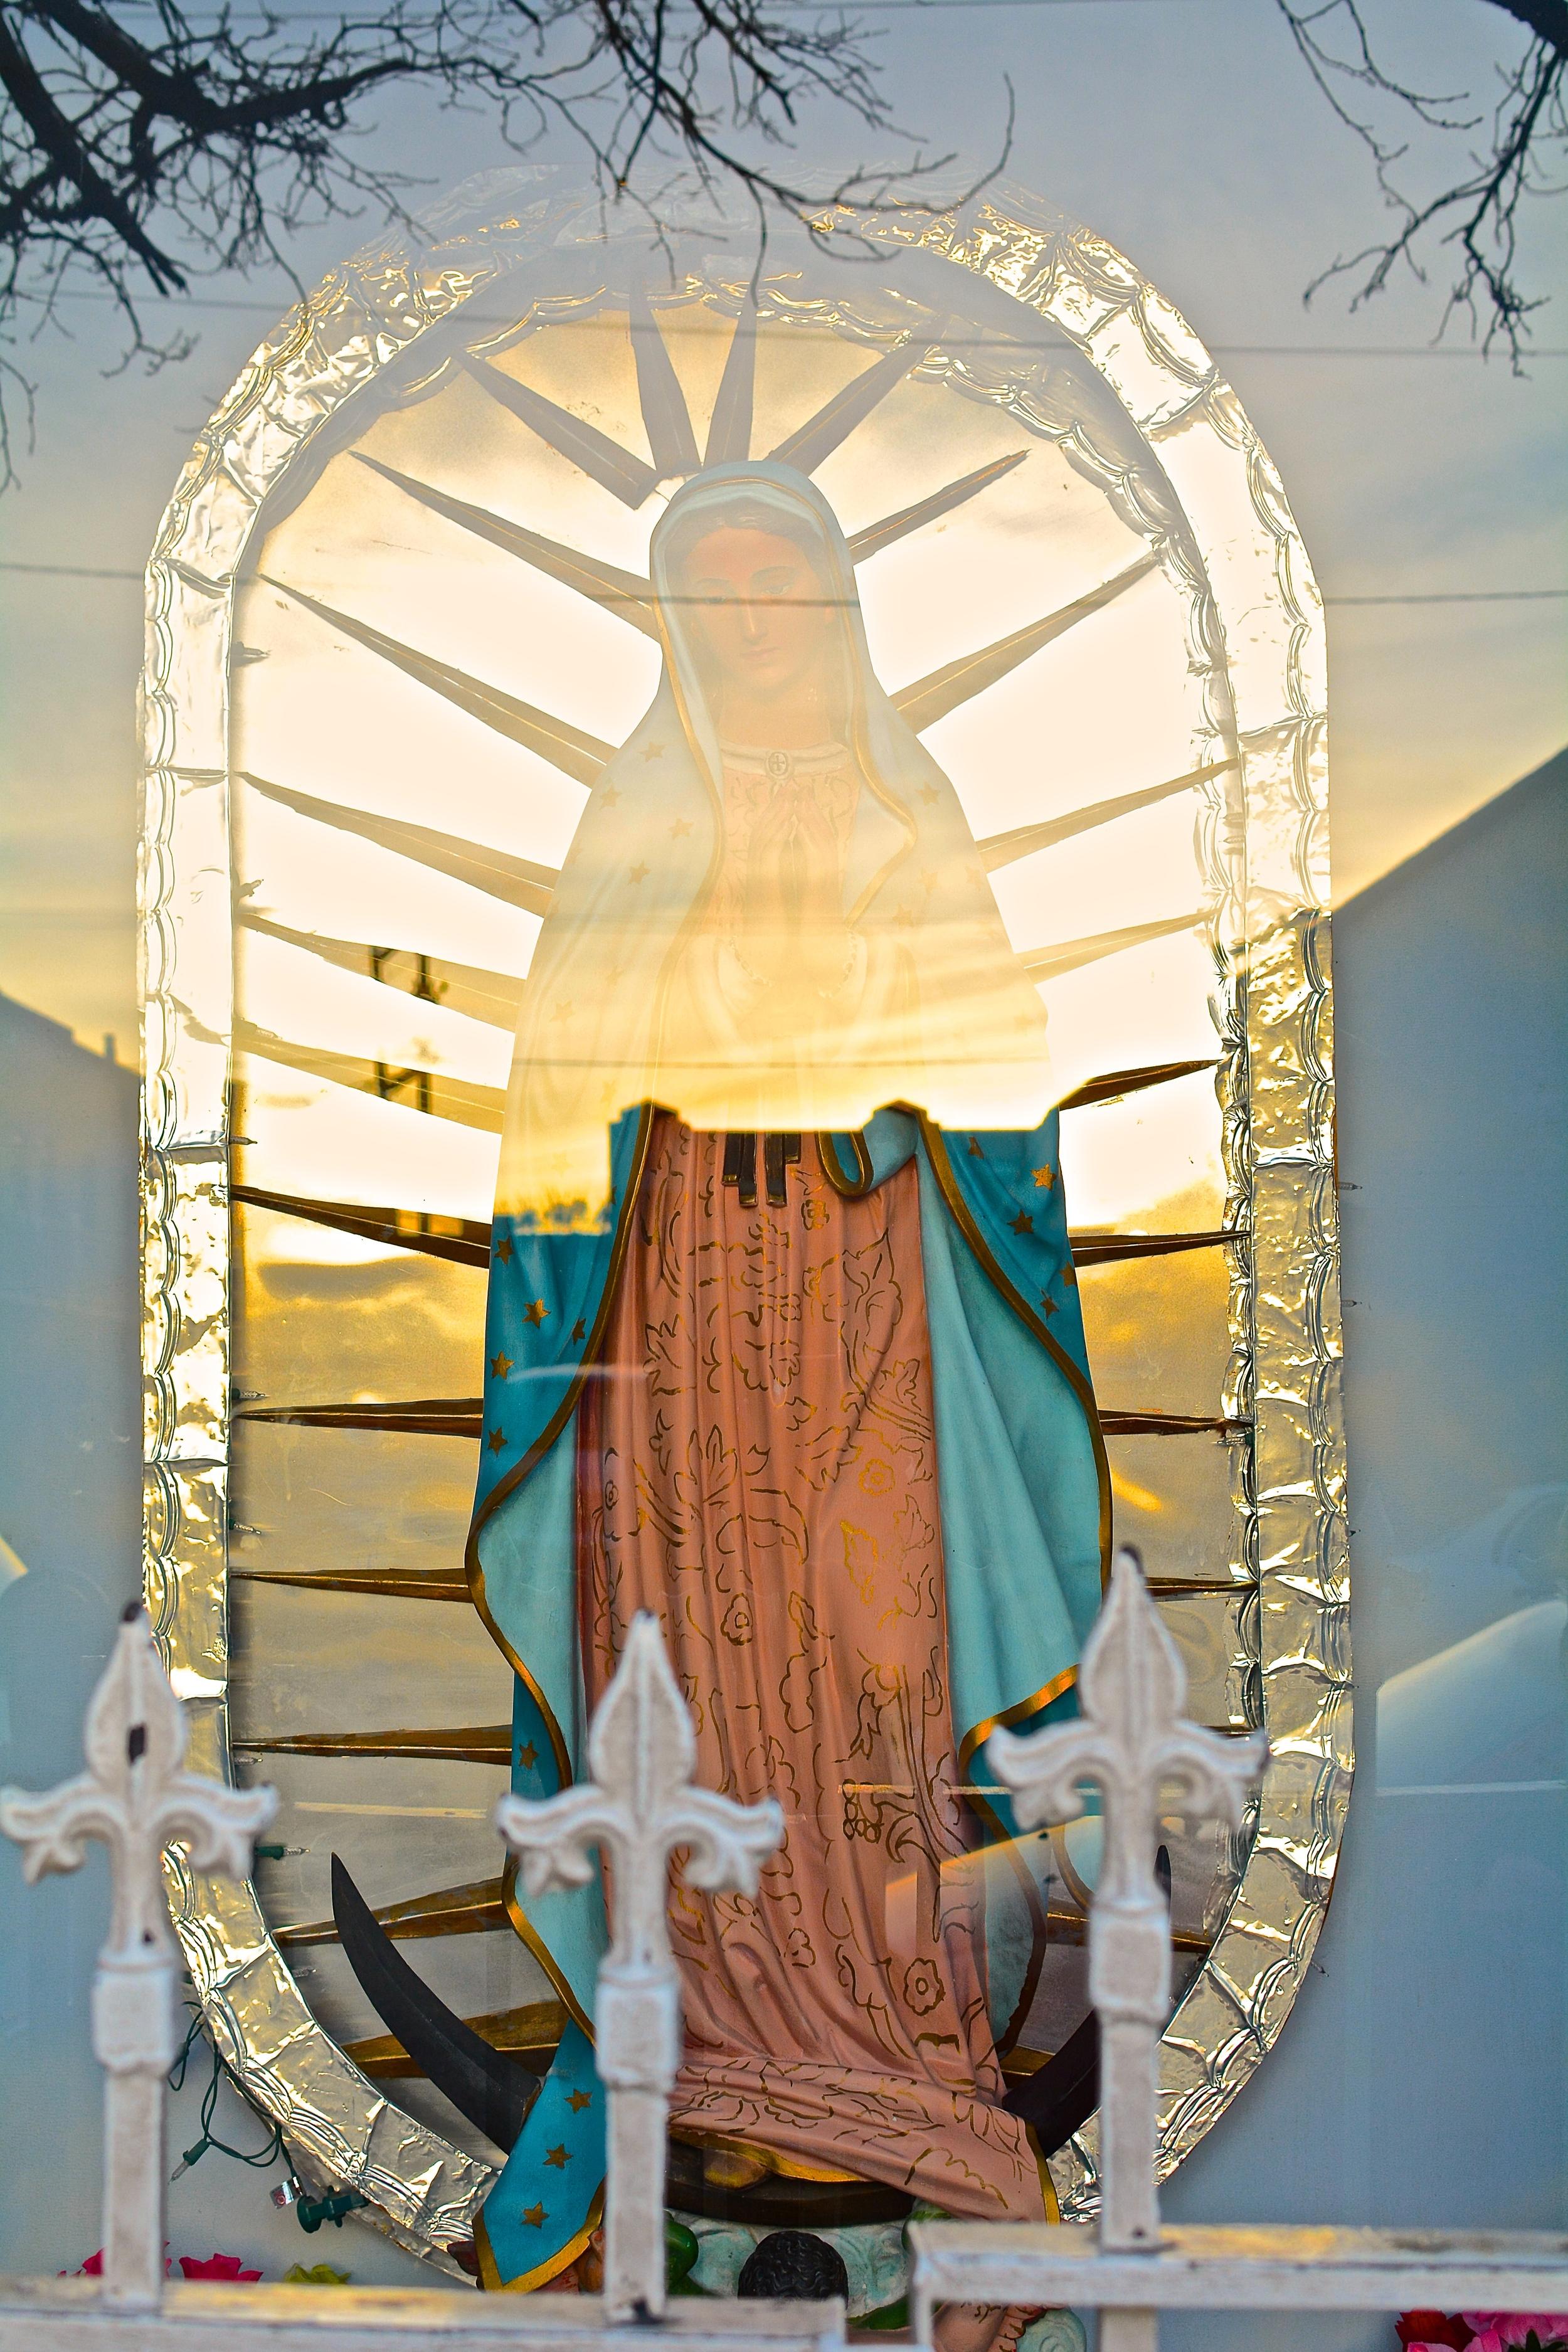 Virgen of St. Patrick's Cathedral by Carlos Hernandez